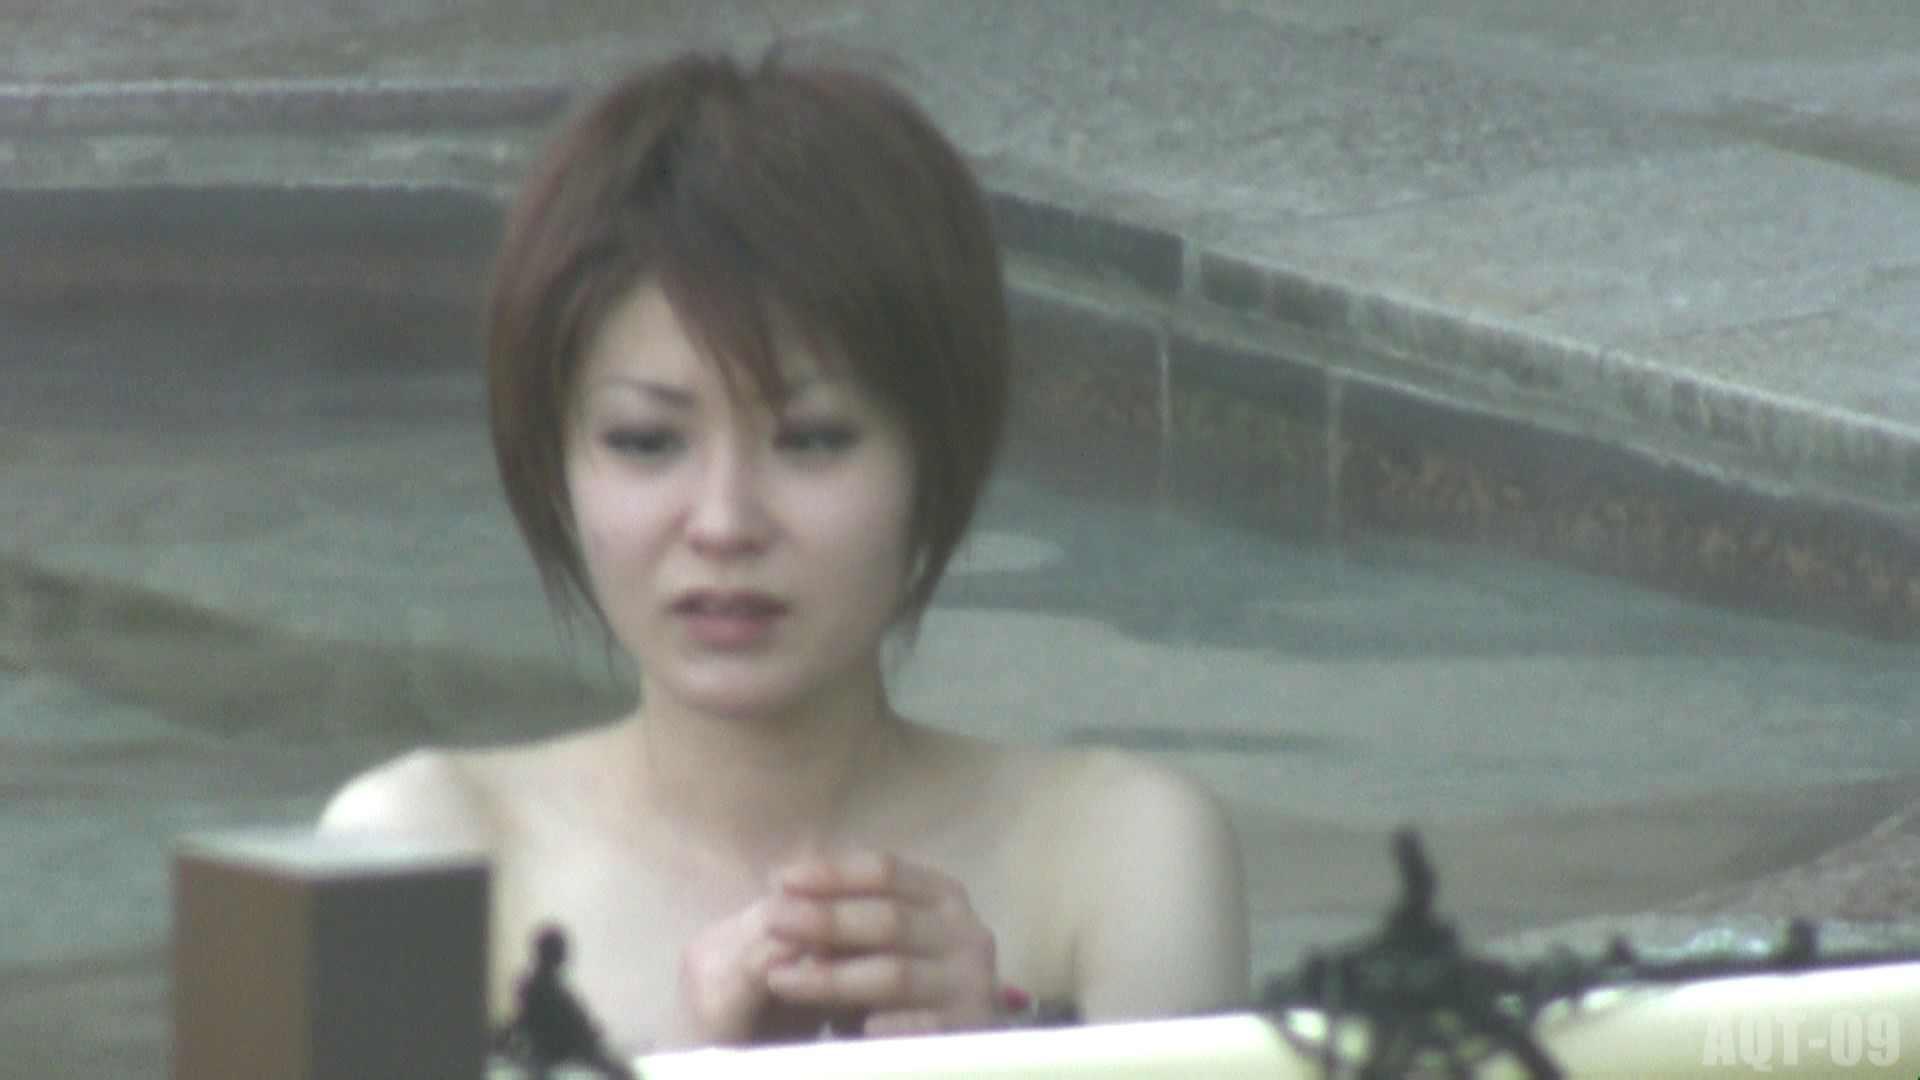 Aquaな露天風呂Vol.779 露天風呂編  99PIX 78